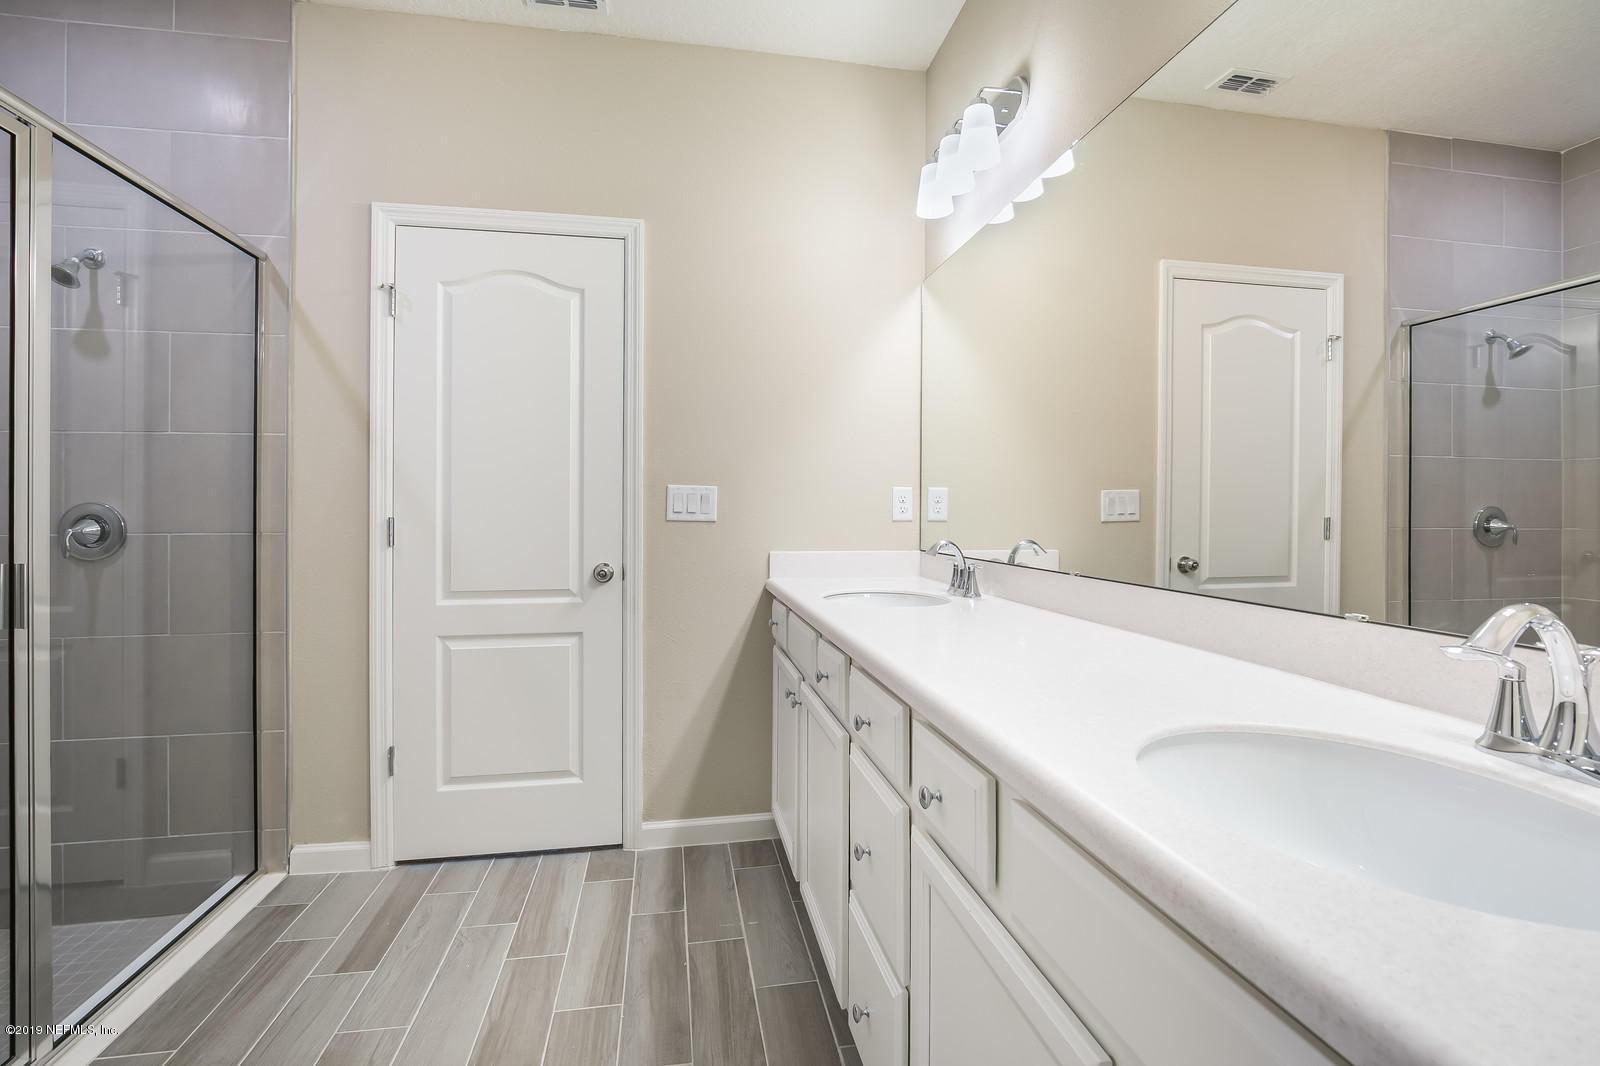 6918 ODEN CREEK, JACKSONVILLE, FLORIDA 32222, 3 Bedrooms Bedrooms, ,2 BathroomsBathrooms,Residential - single family,For sale,ODEN CREEK,979659